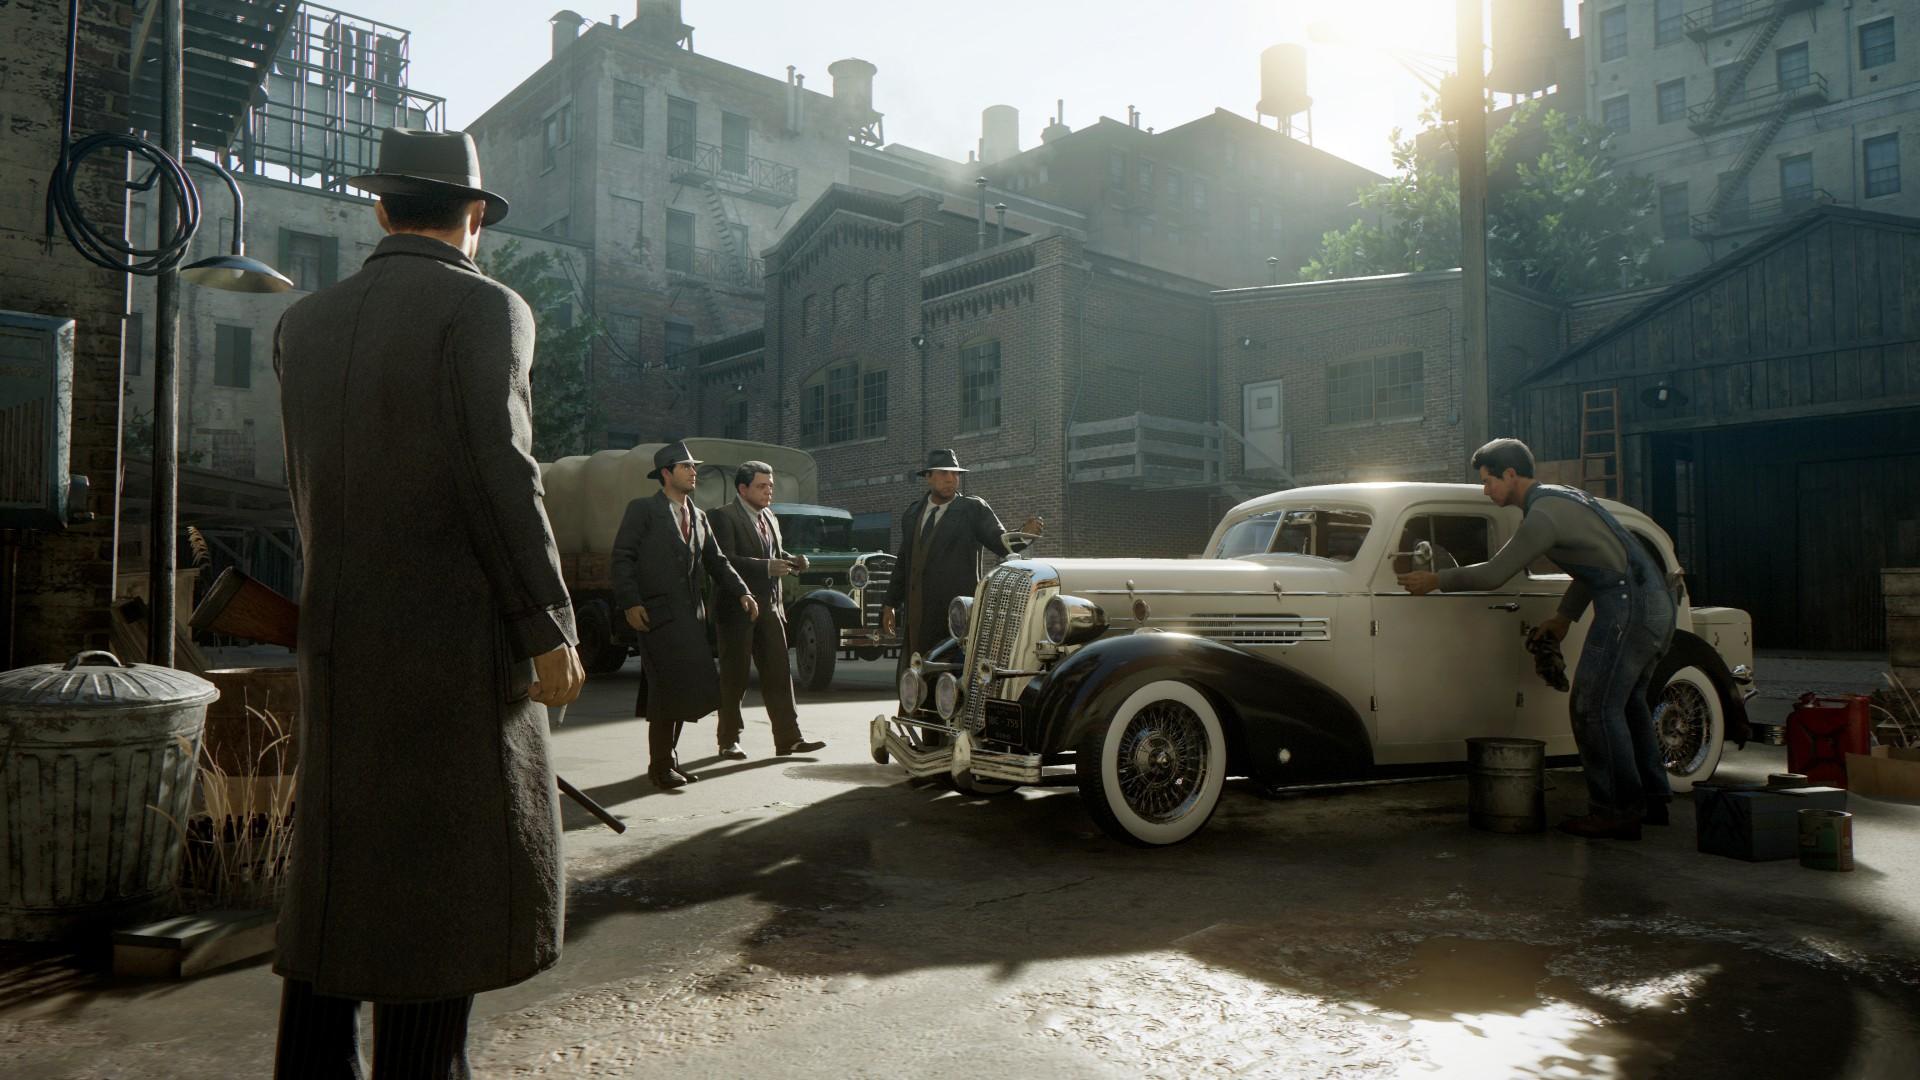 mafia-definitive-edition-1920x1080-mafia-trilogy-screenshot-4k-22534.jpg - Mafia: The City of Lost Heaven